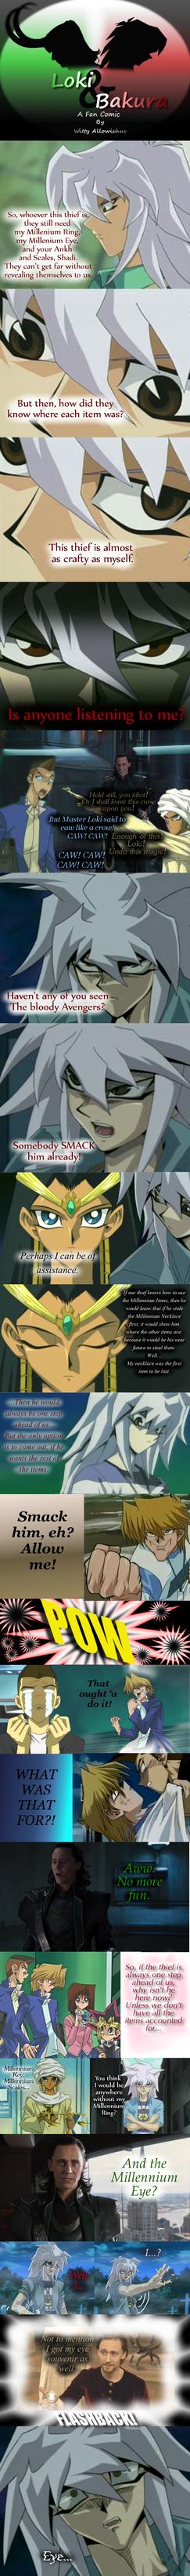 Loki and Bakura XXV - The Eye by Witty-Allowishus